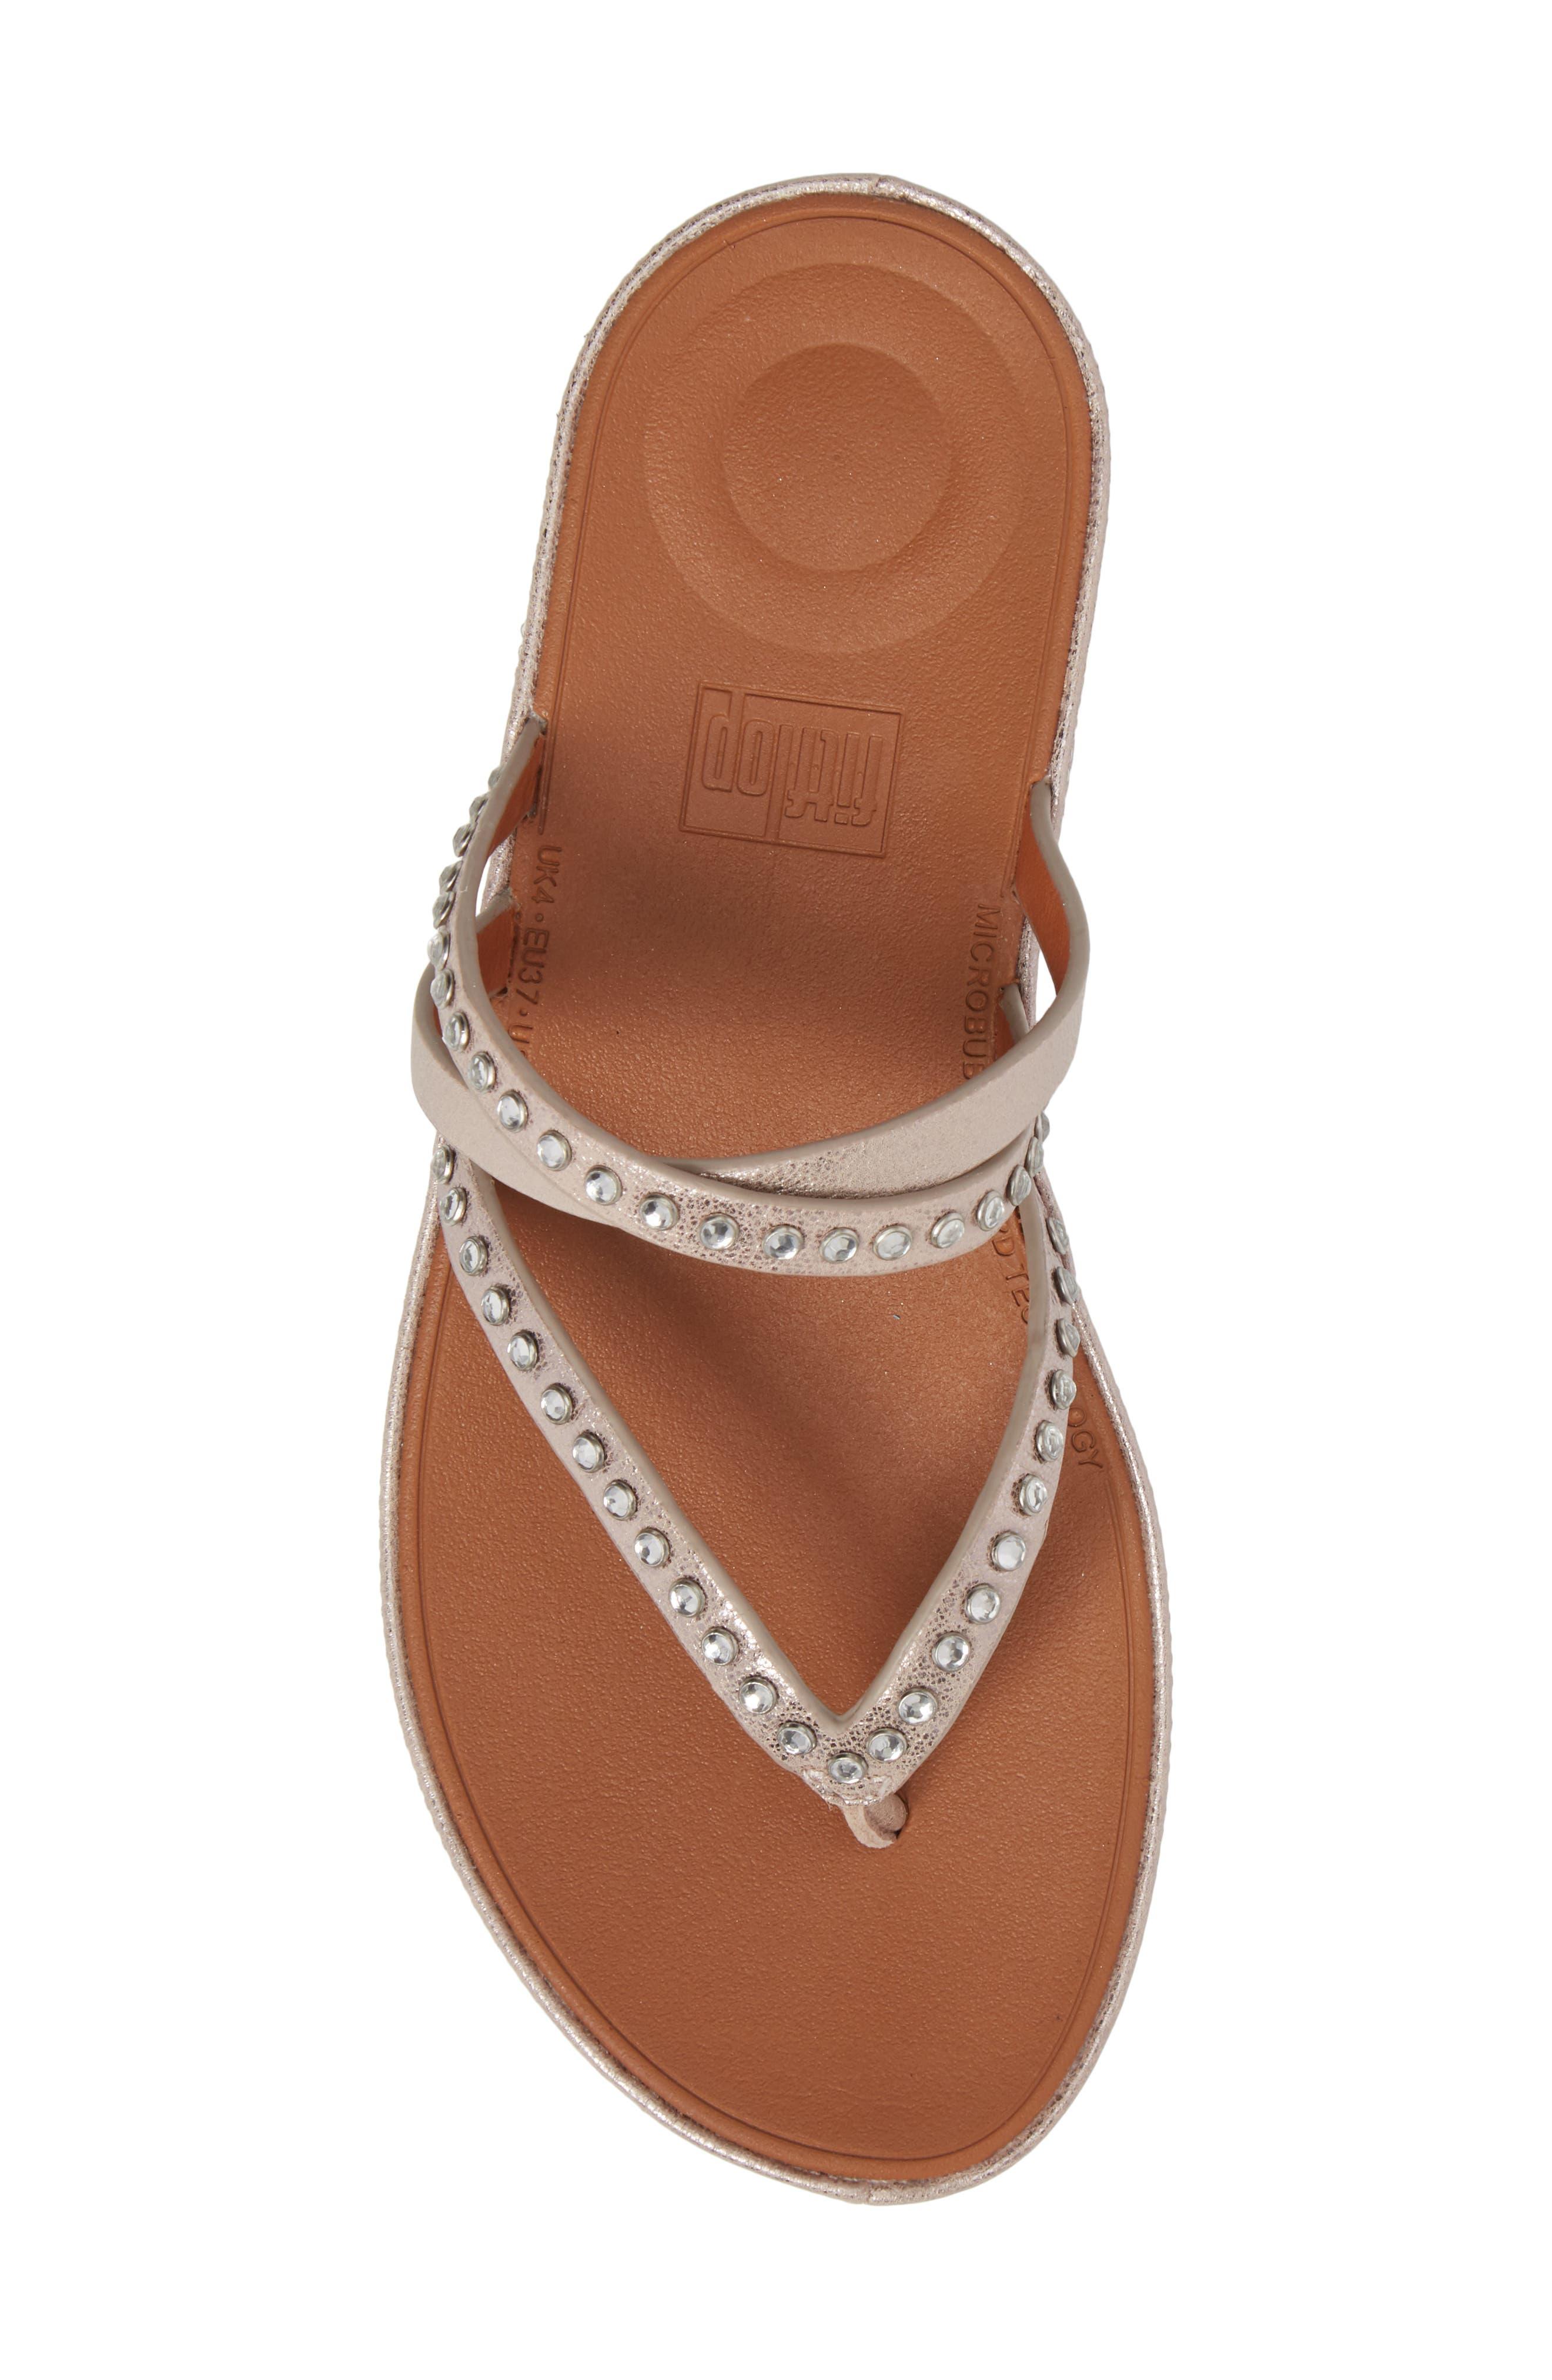 Linny Embellished Slide Sandal,                             Alternate thumbnail 5, color,                             Blush/ Metallic Nude Leather